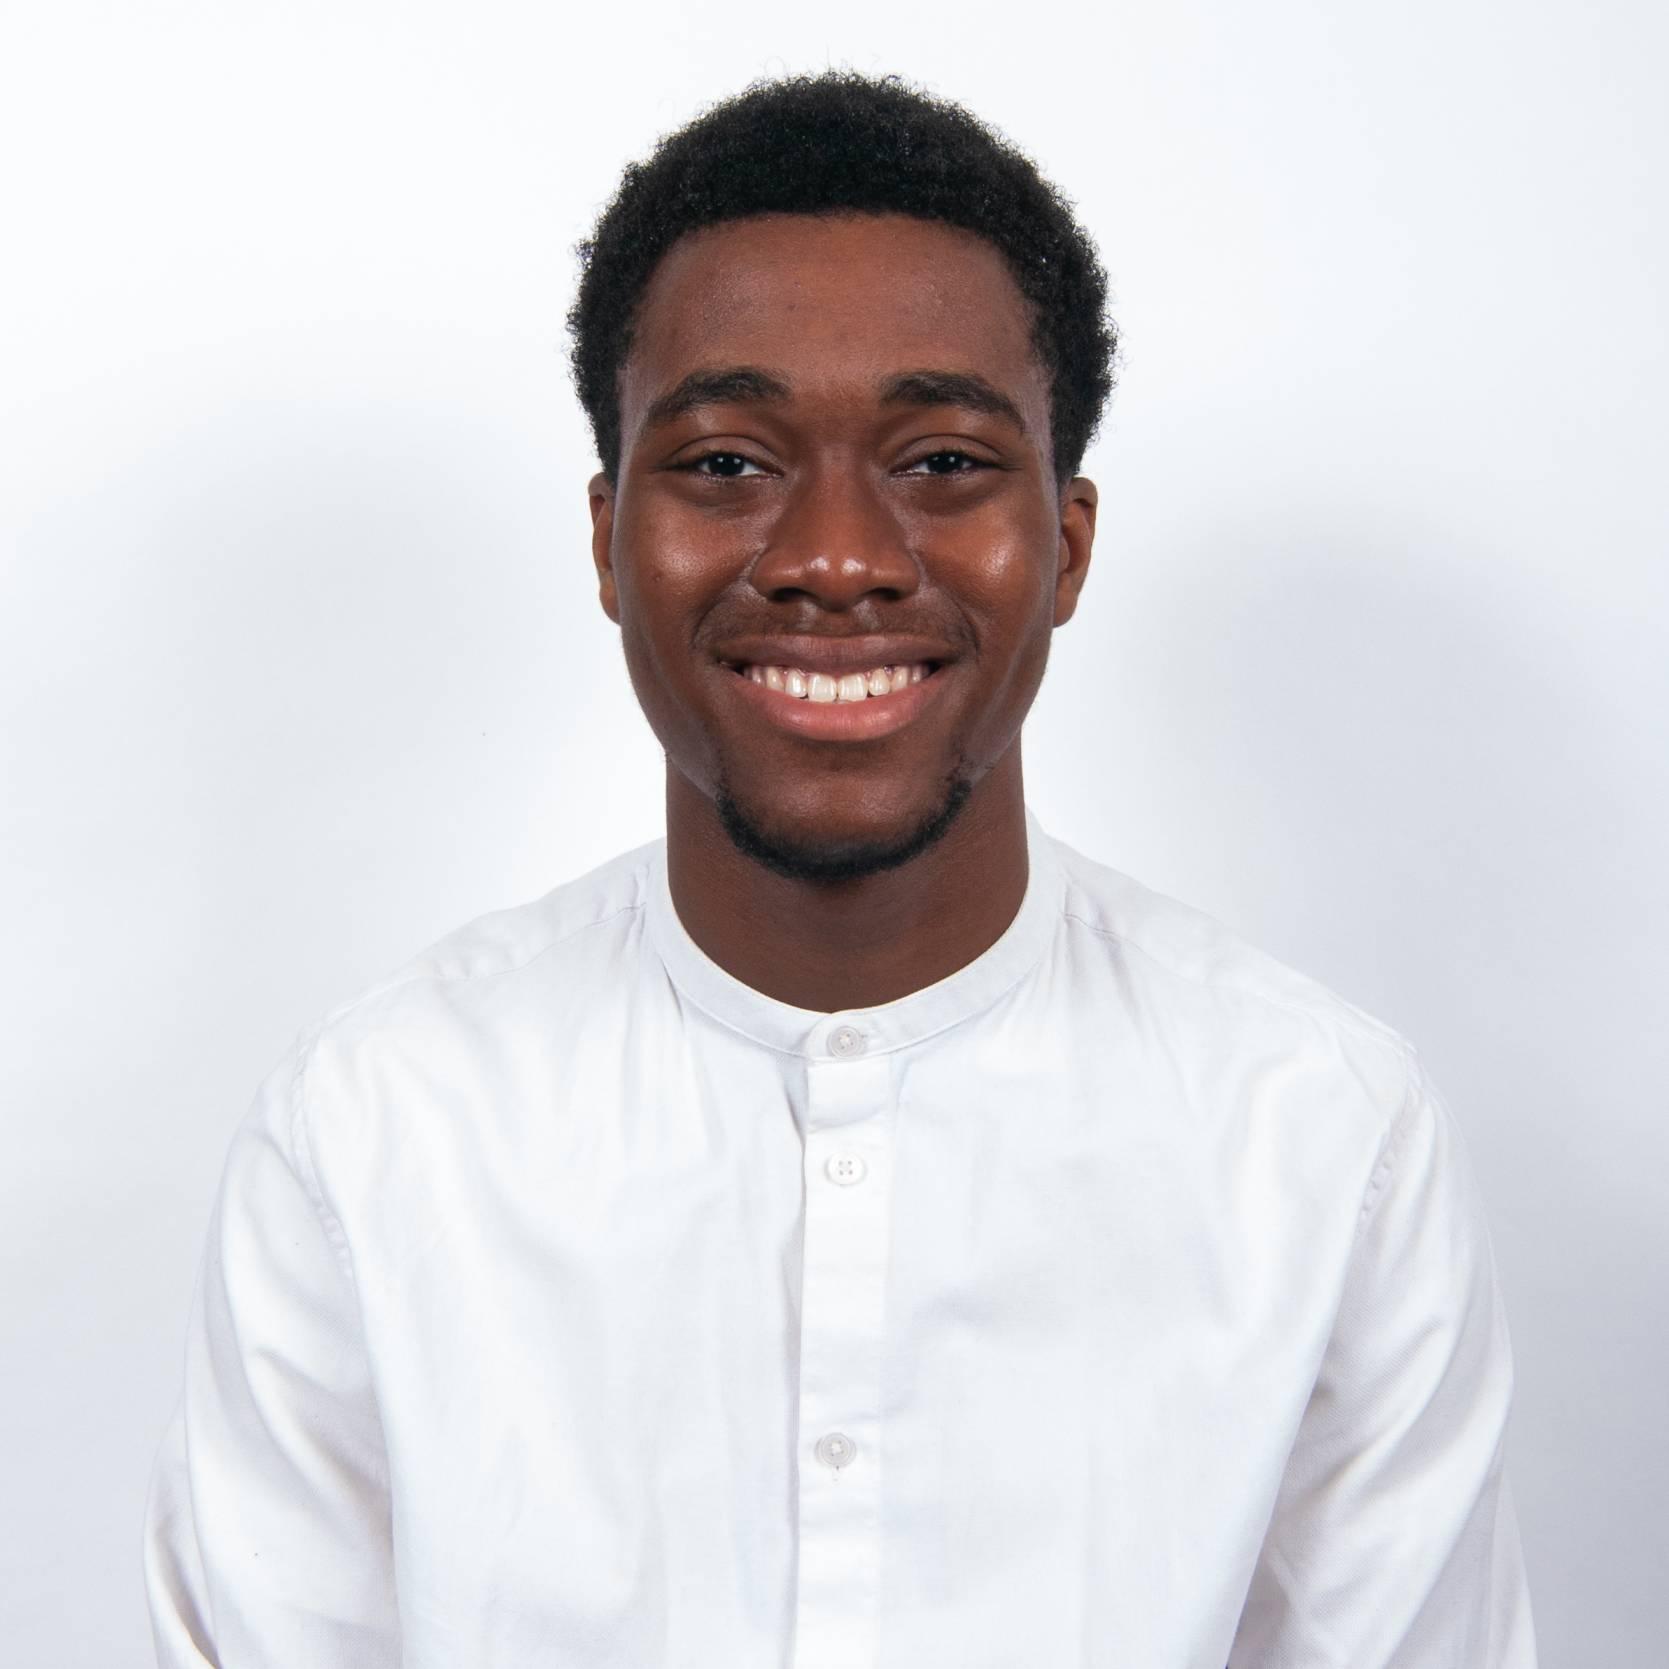 Photo of FMTV Graduate Stephen Owusu